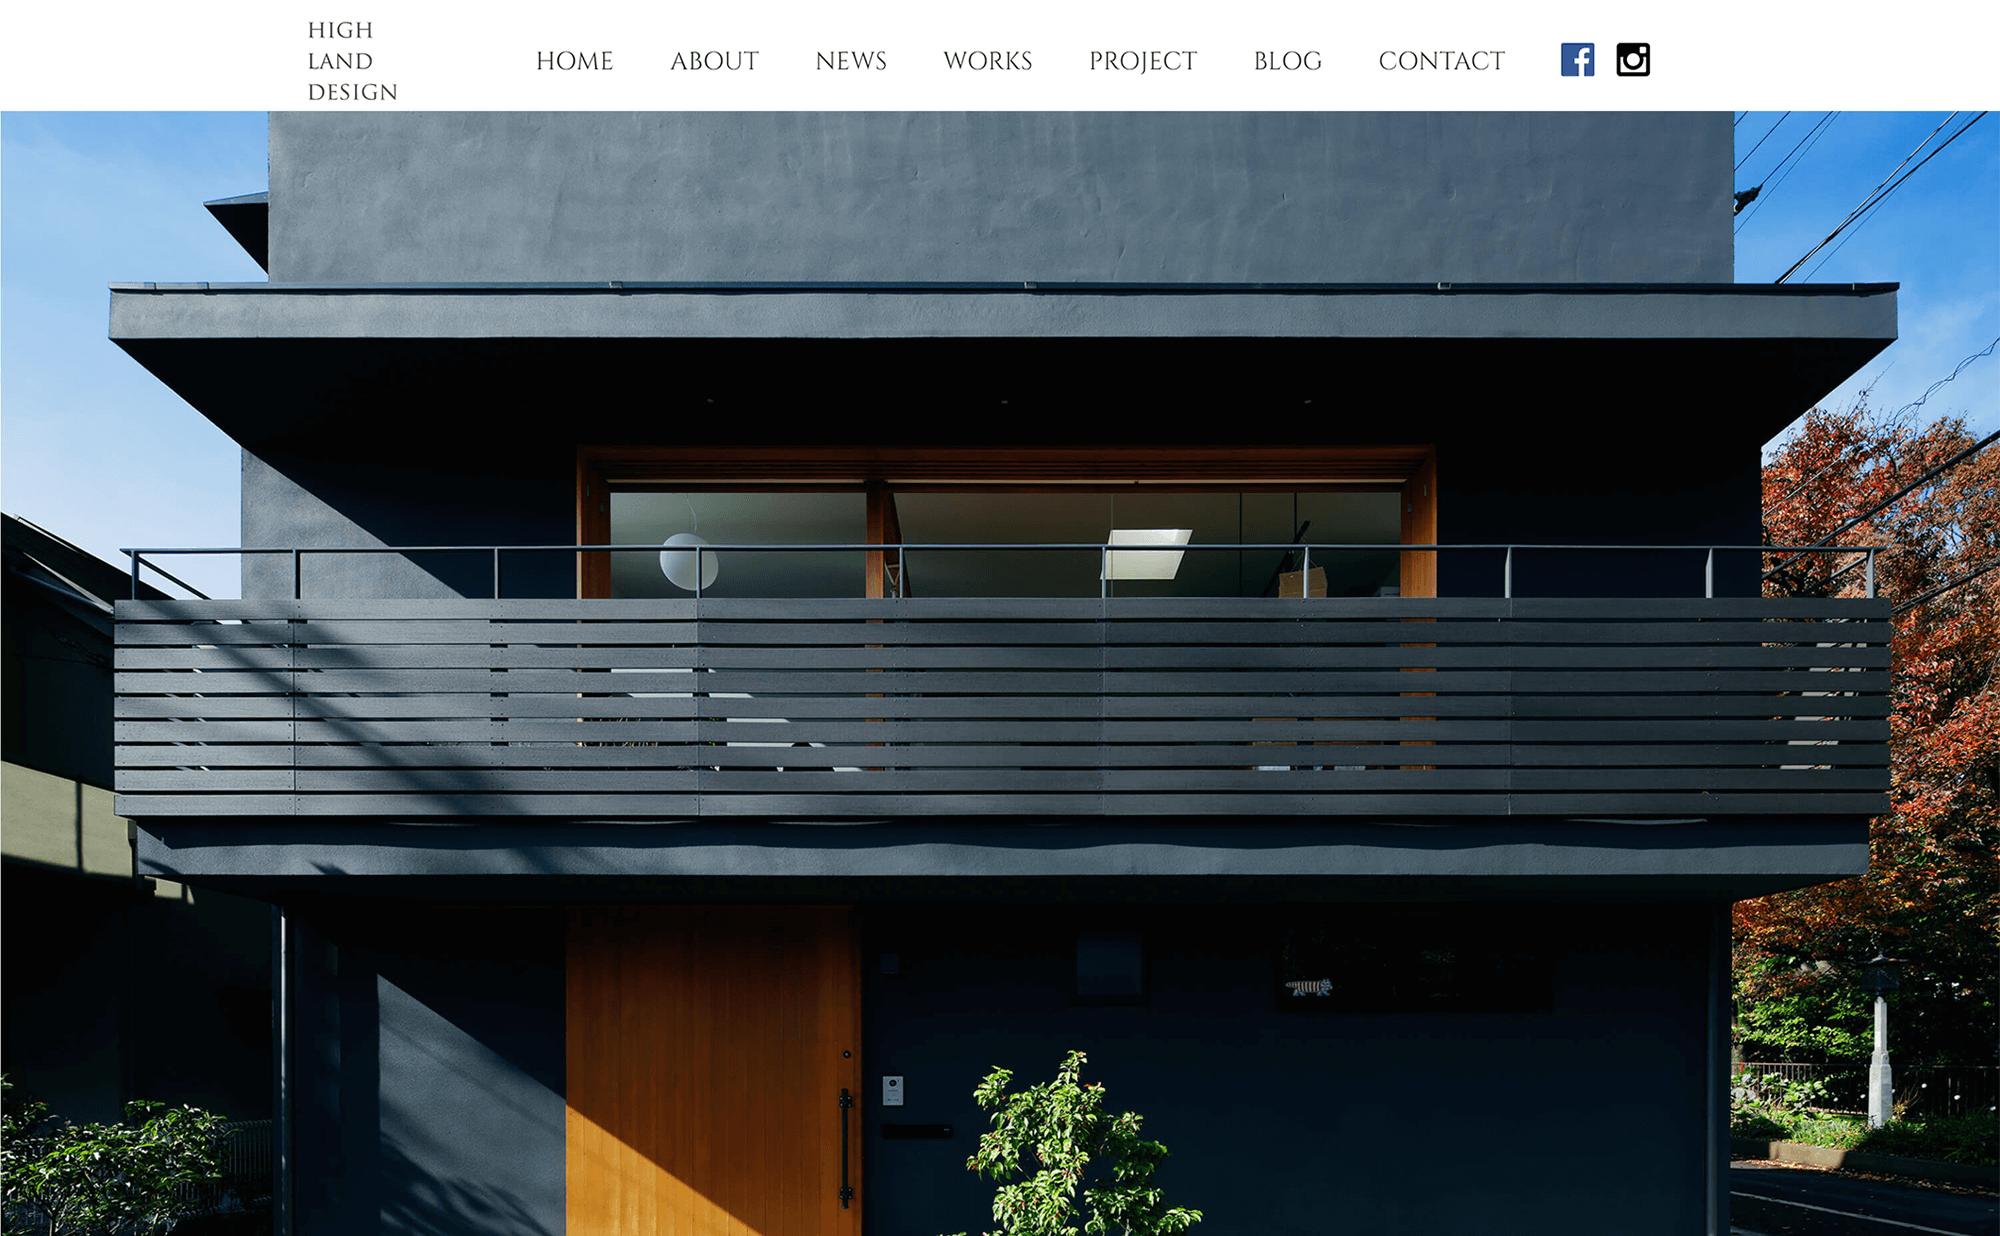 High Land Design architests office